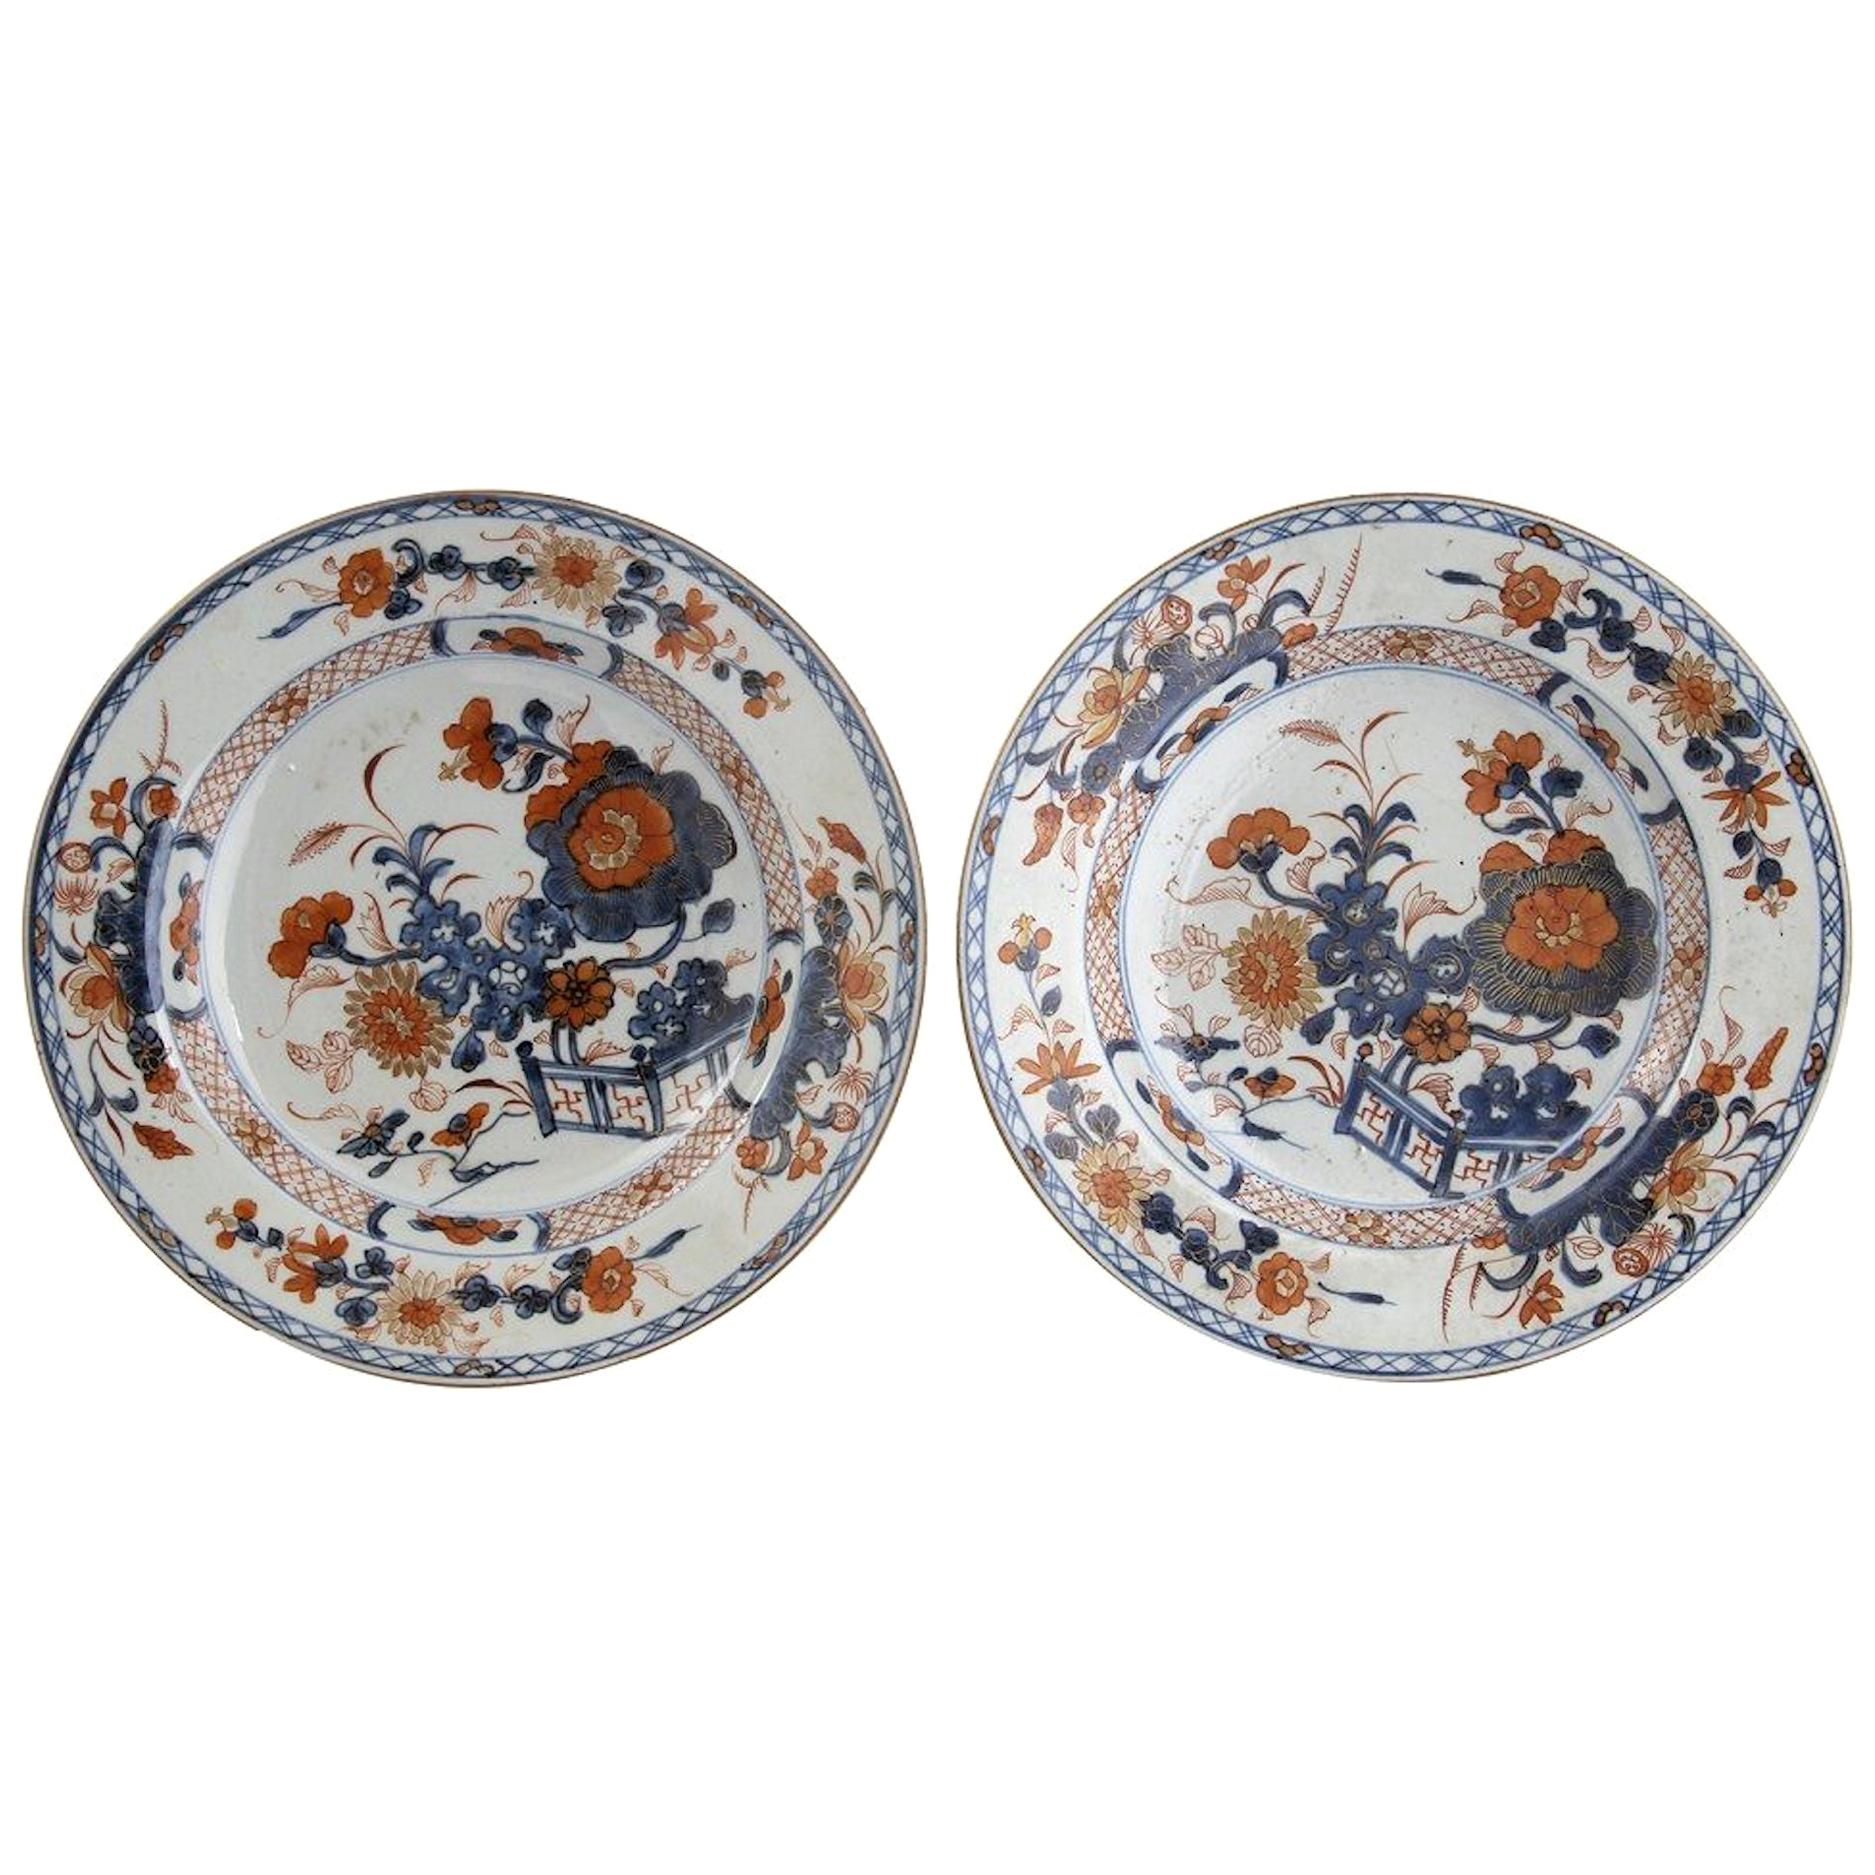 Ancient Imari Style Porcelain Dishes, Qing Dynasty China